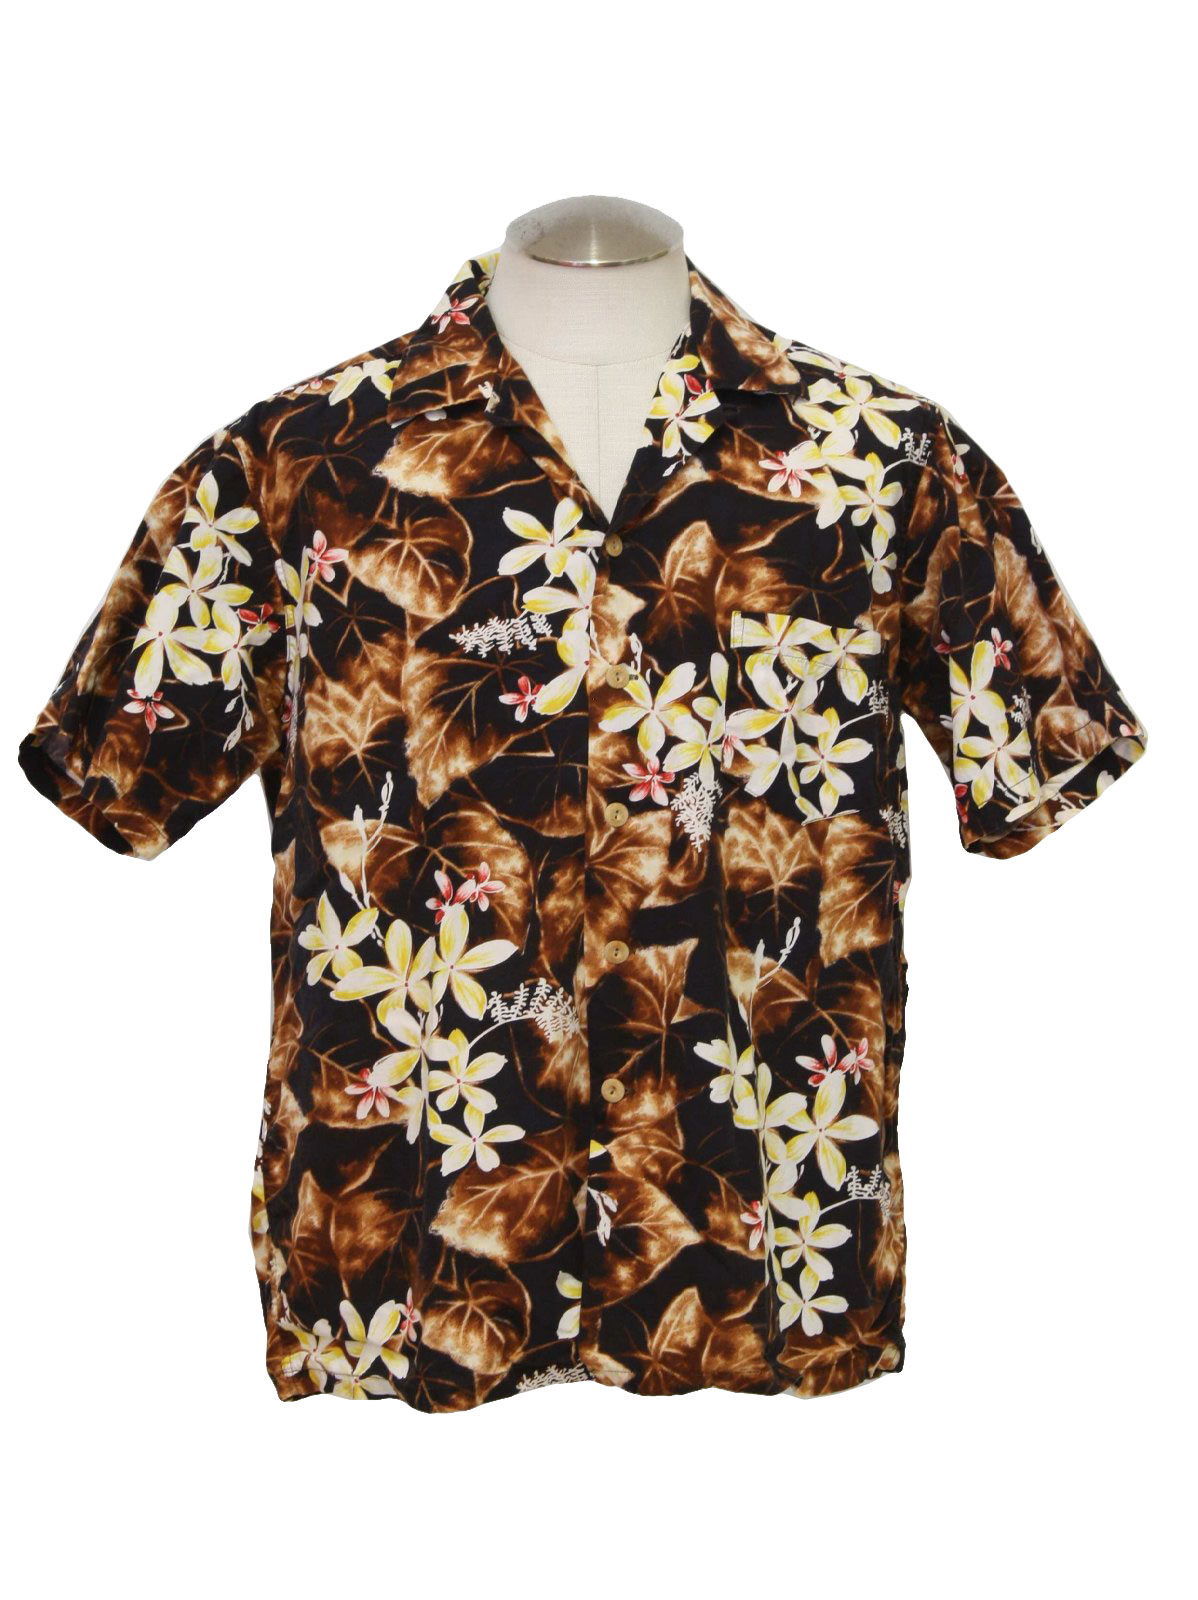 50s Hawaiian Shirt (Kamehameha): Late 50s or early 60s -Kamehameha ...